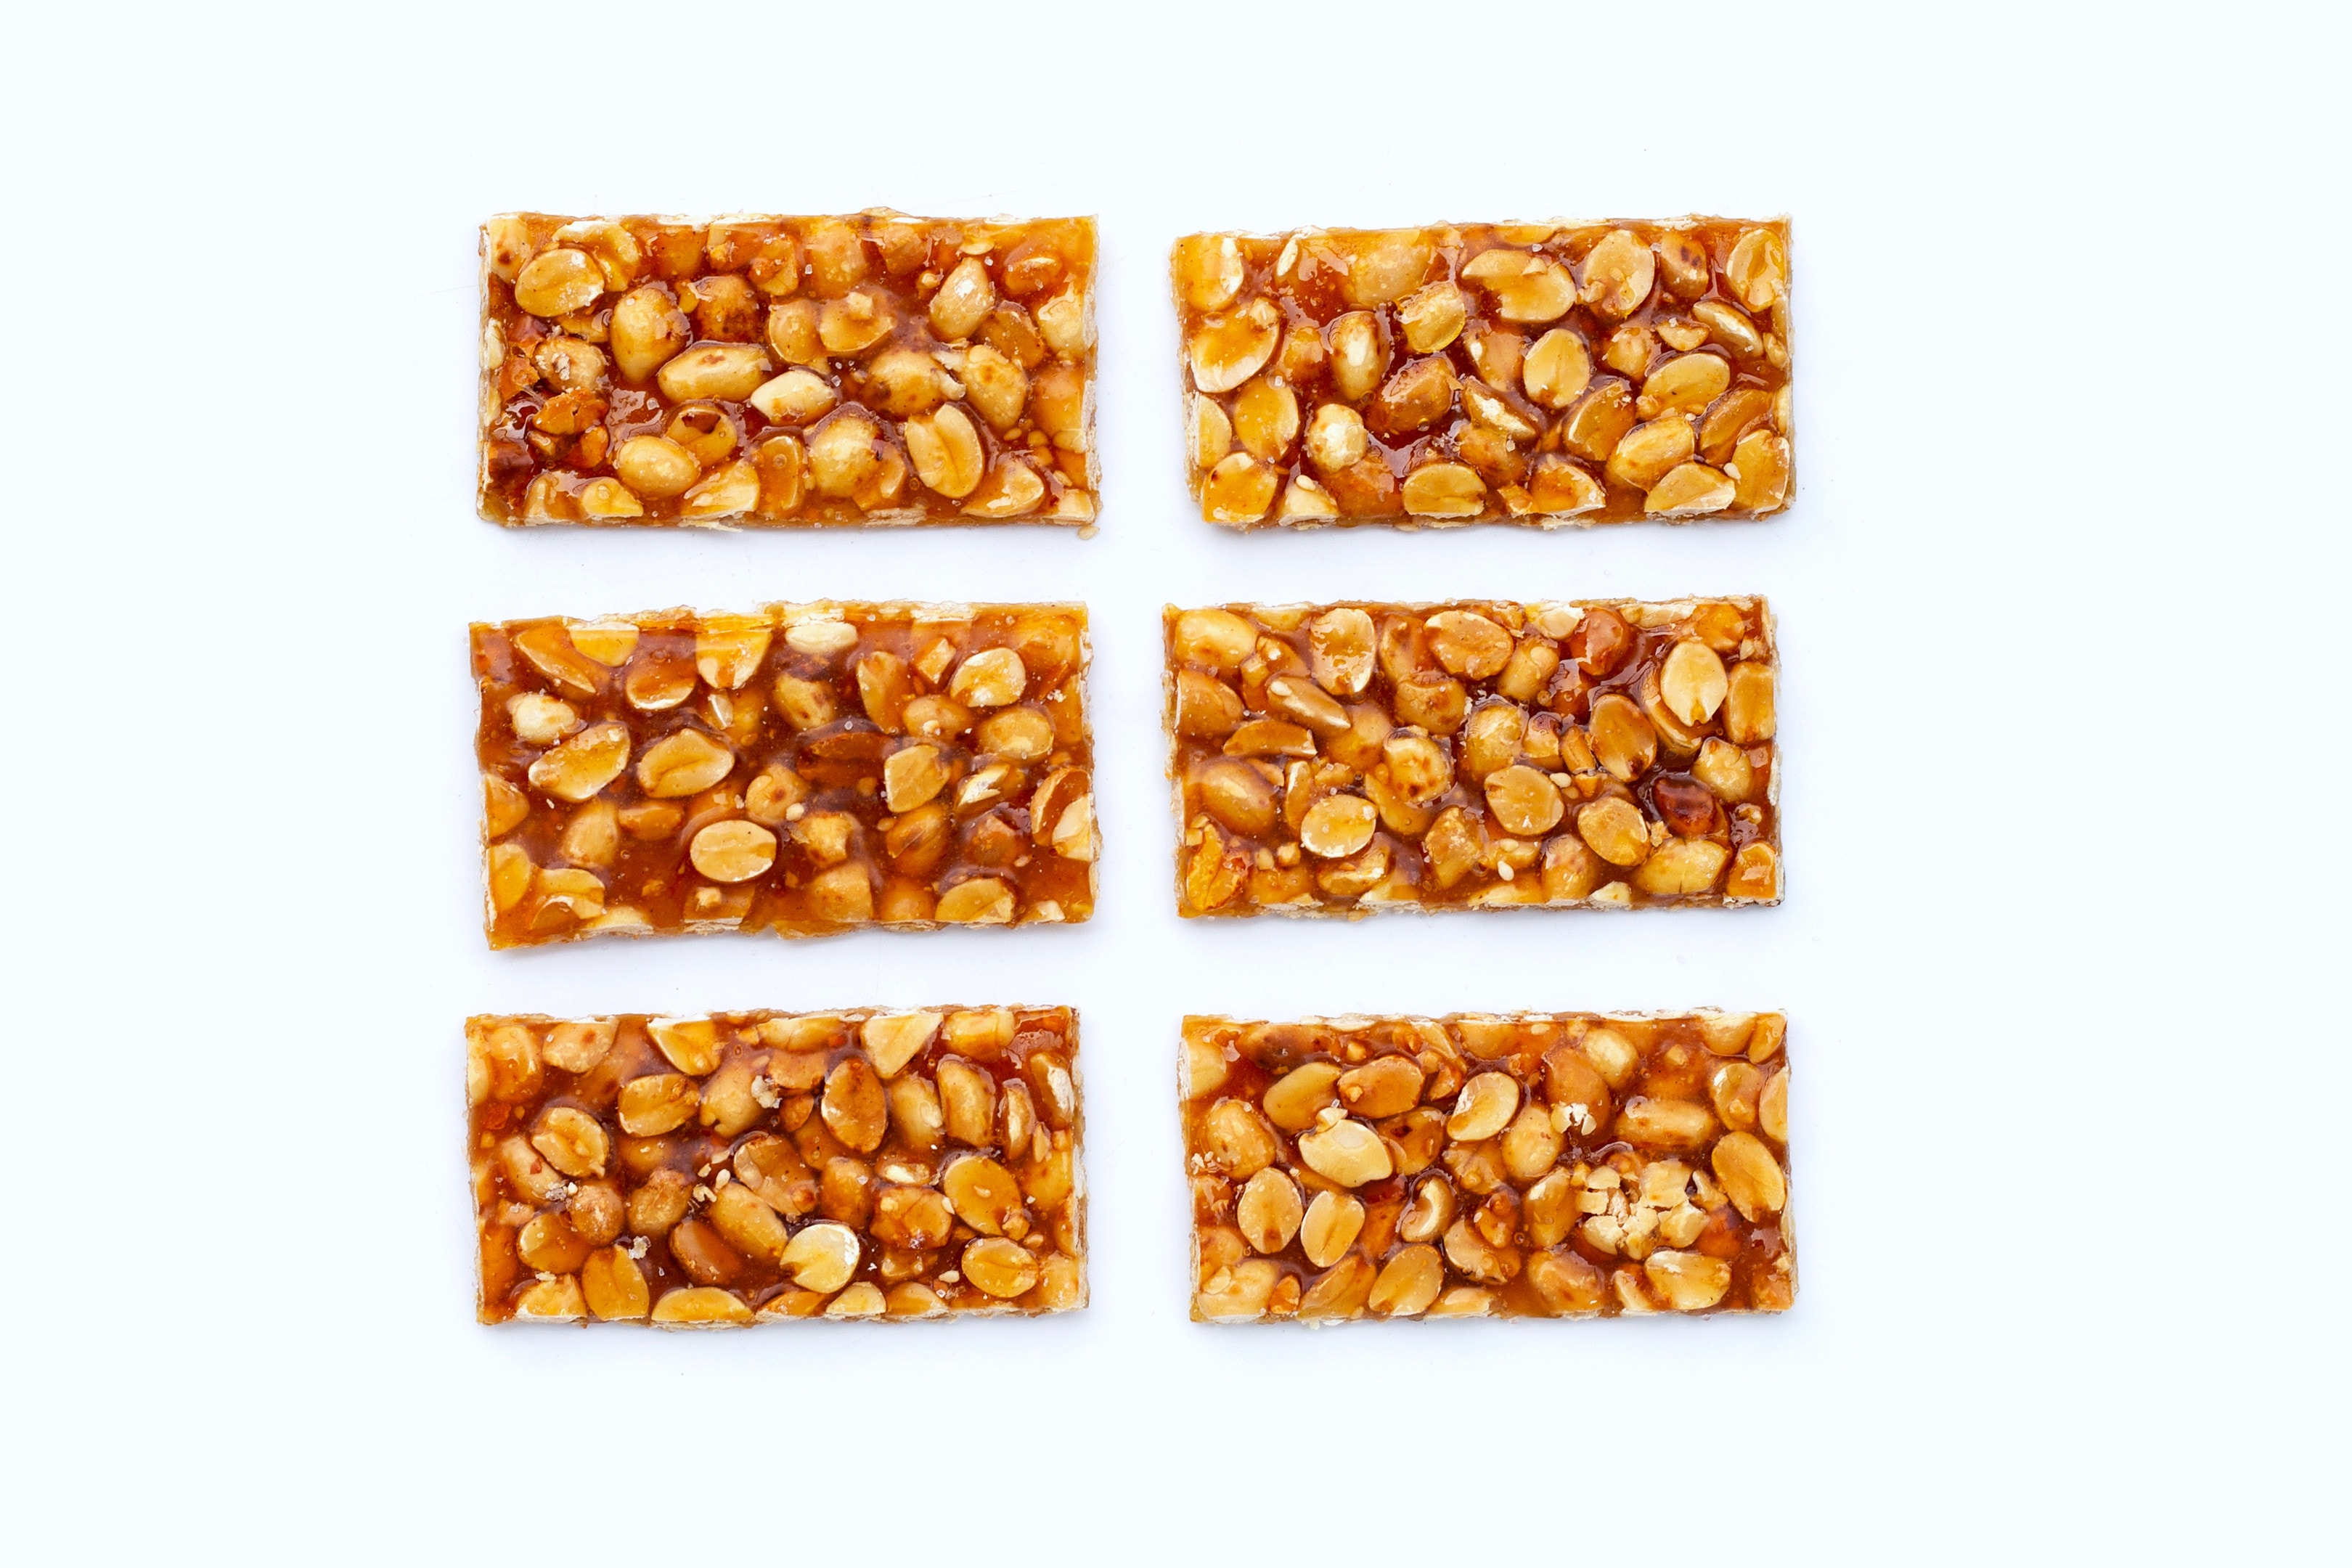 Kadalai mittai — peanuts and jaggery bars